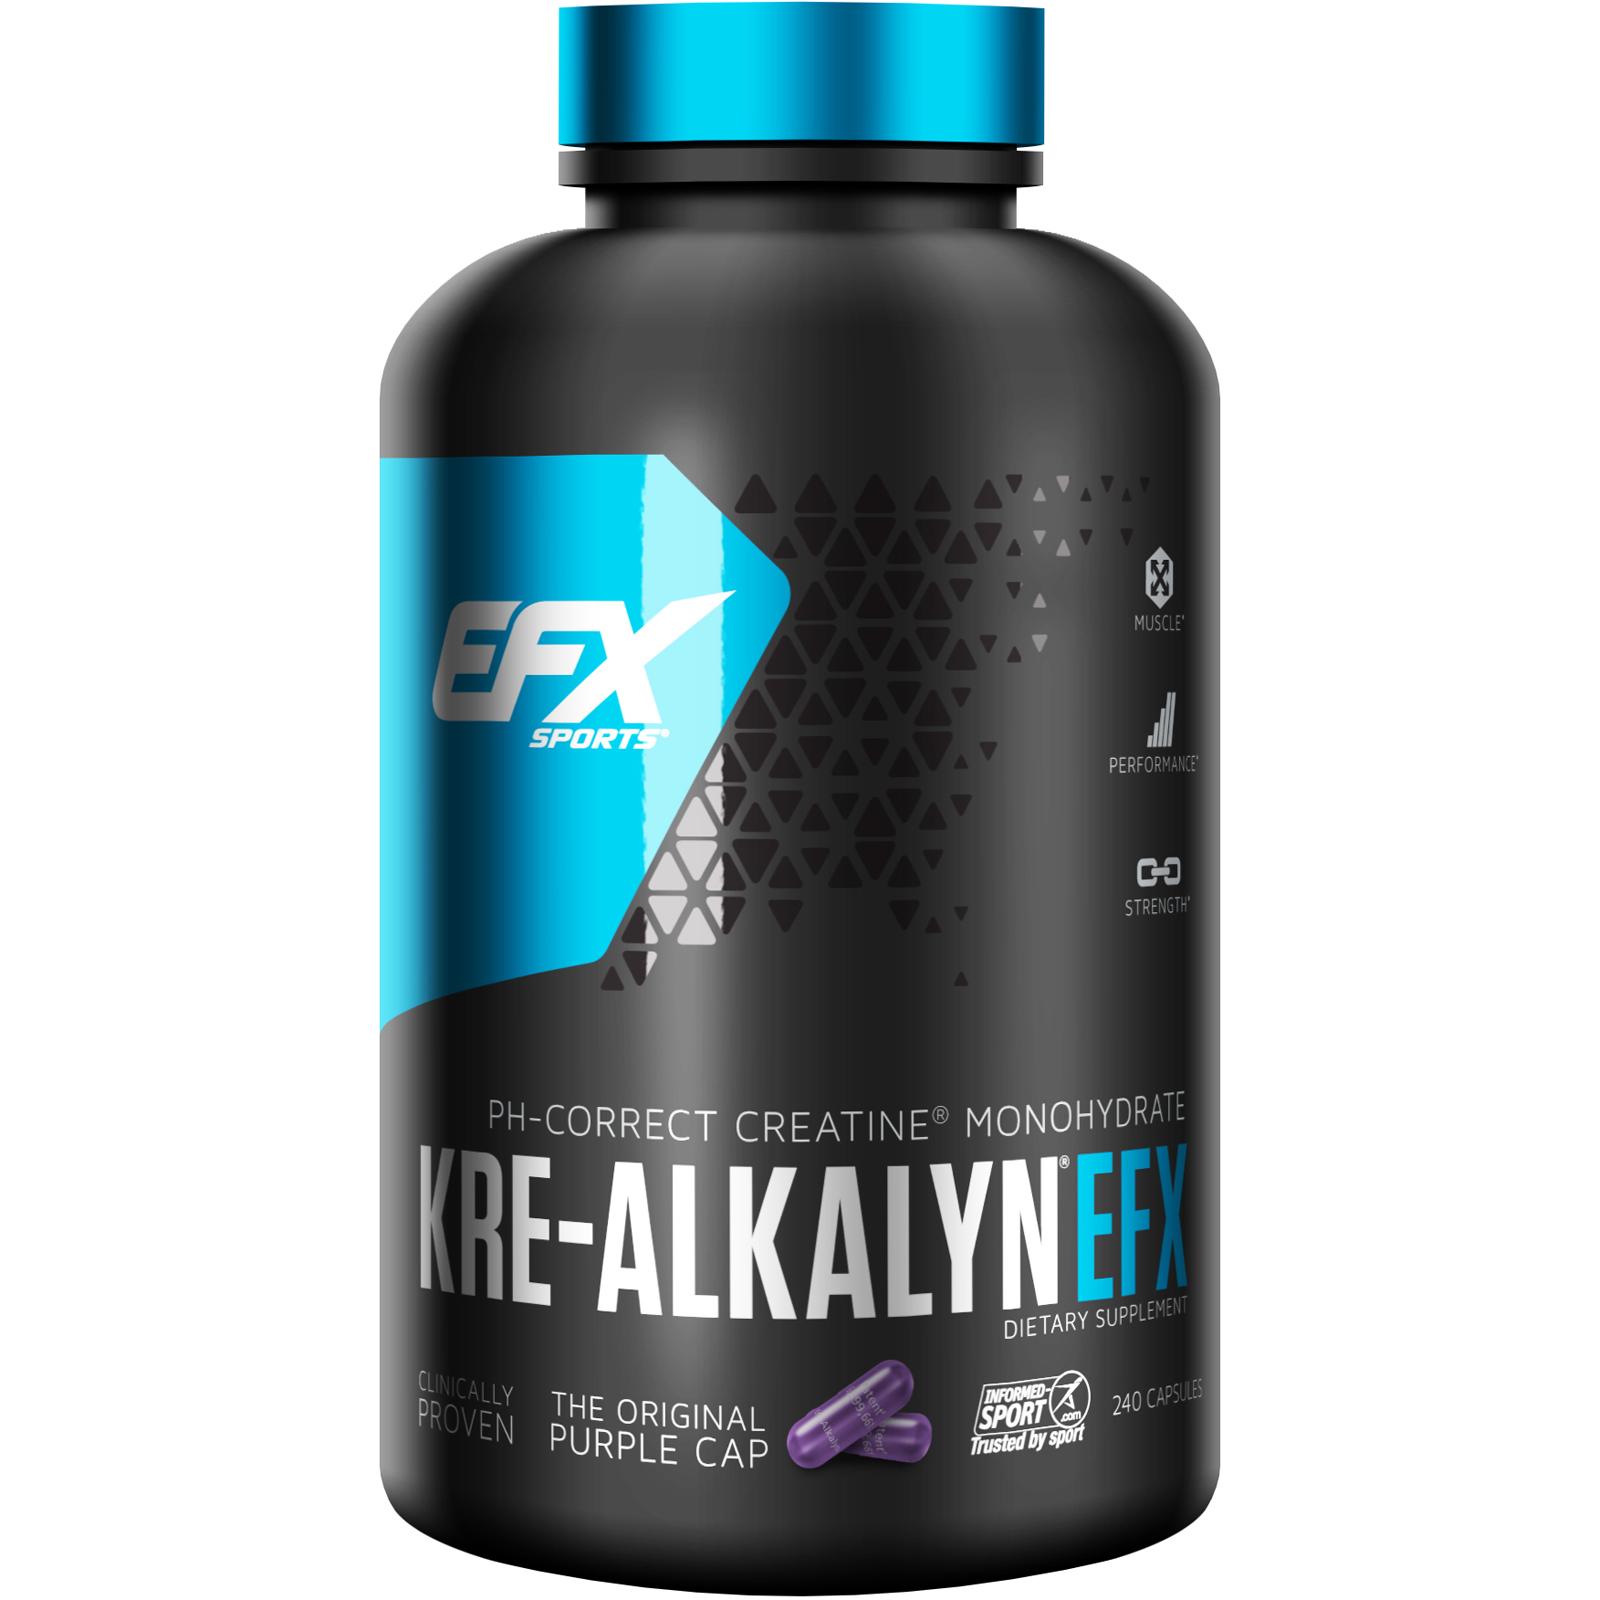 EFX Sports, クレアルカリンEFX(Kre-Alkalyn EFX), 240カプセル